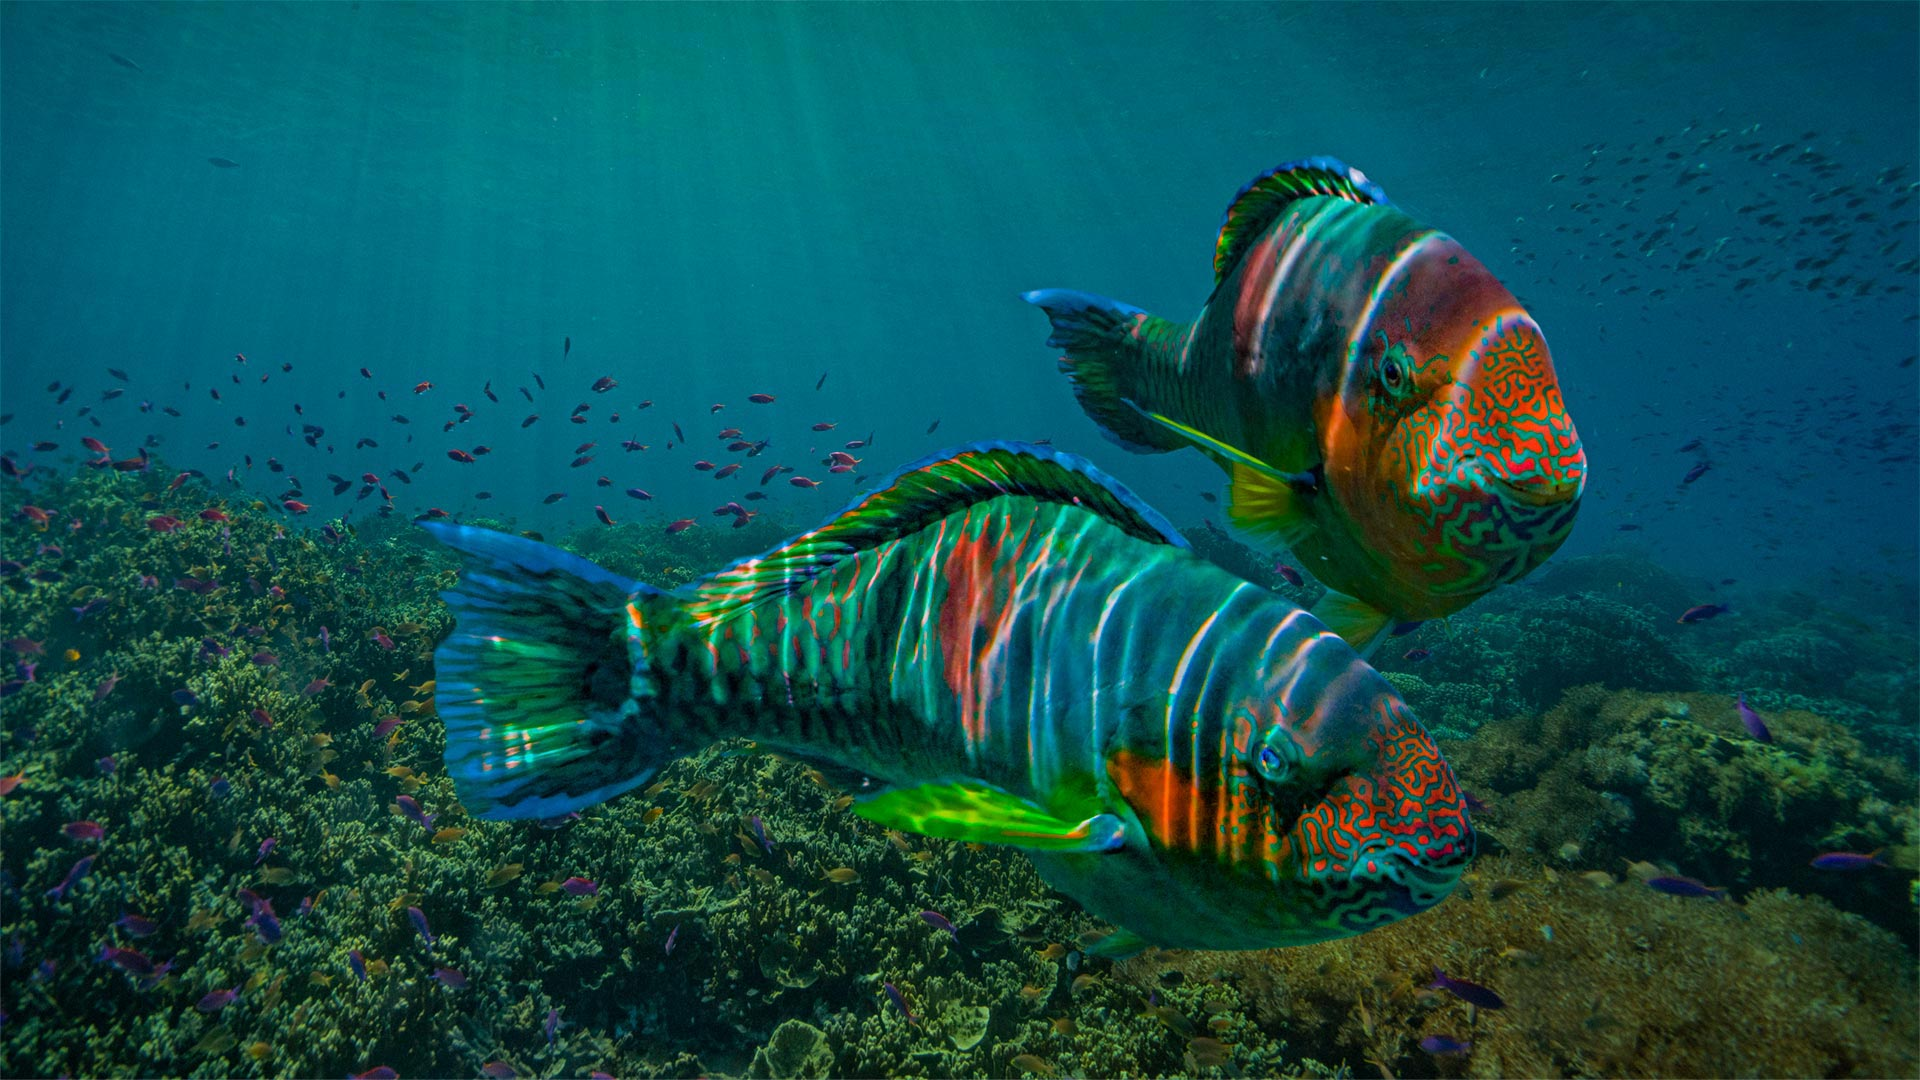 General 1920x1080 nature animals fish underwater